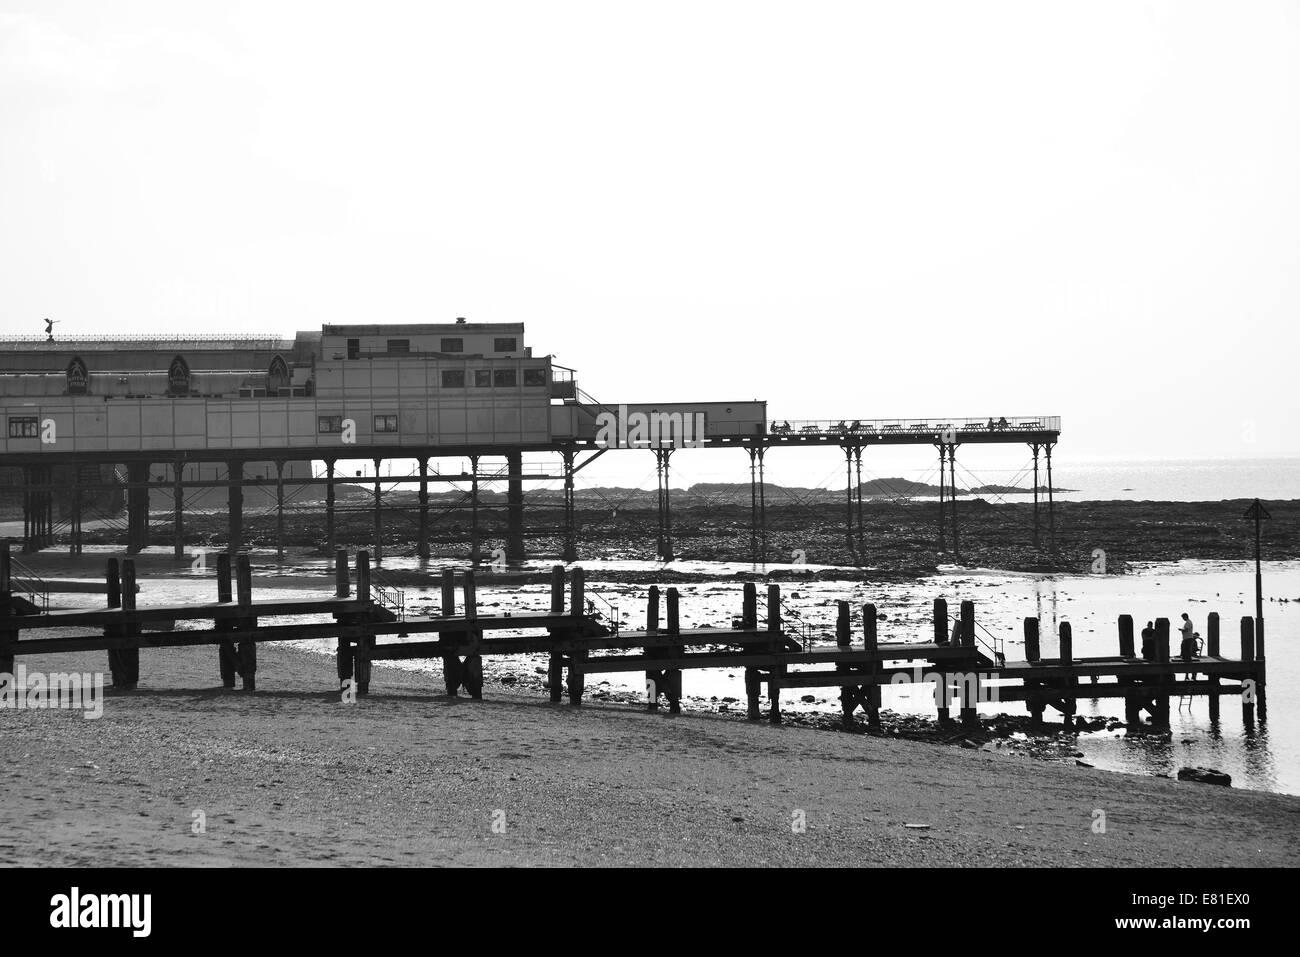 Beach and pier, Aberystwyth, Ceredigion, Wales, United Kingdom - Stock Image